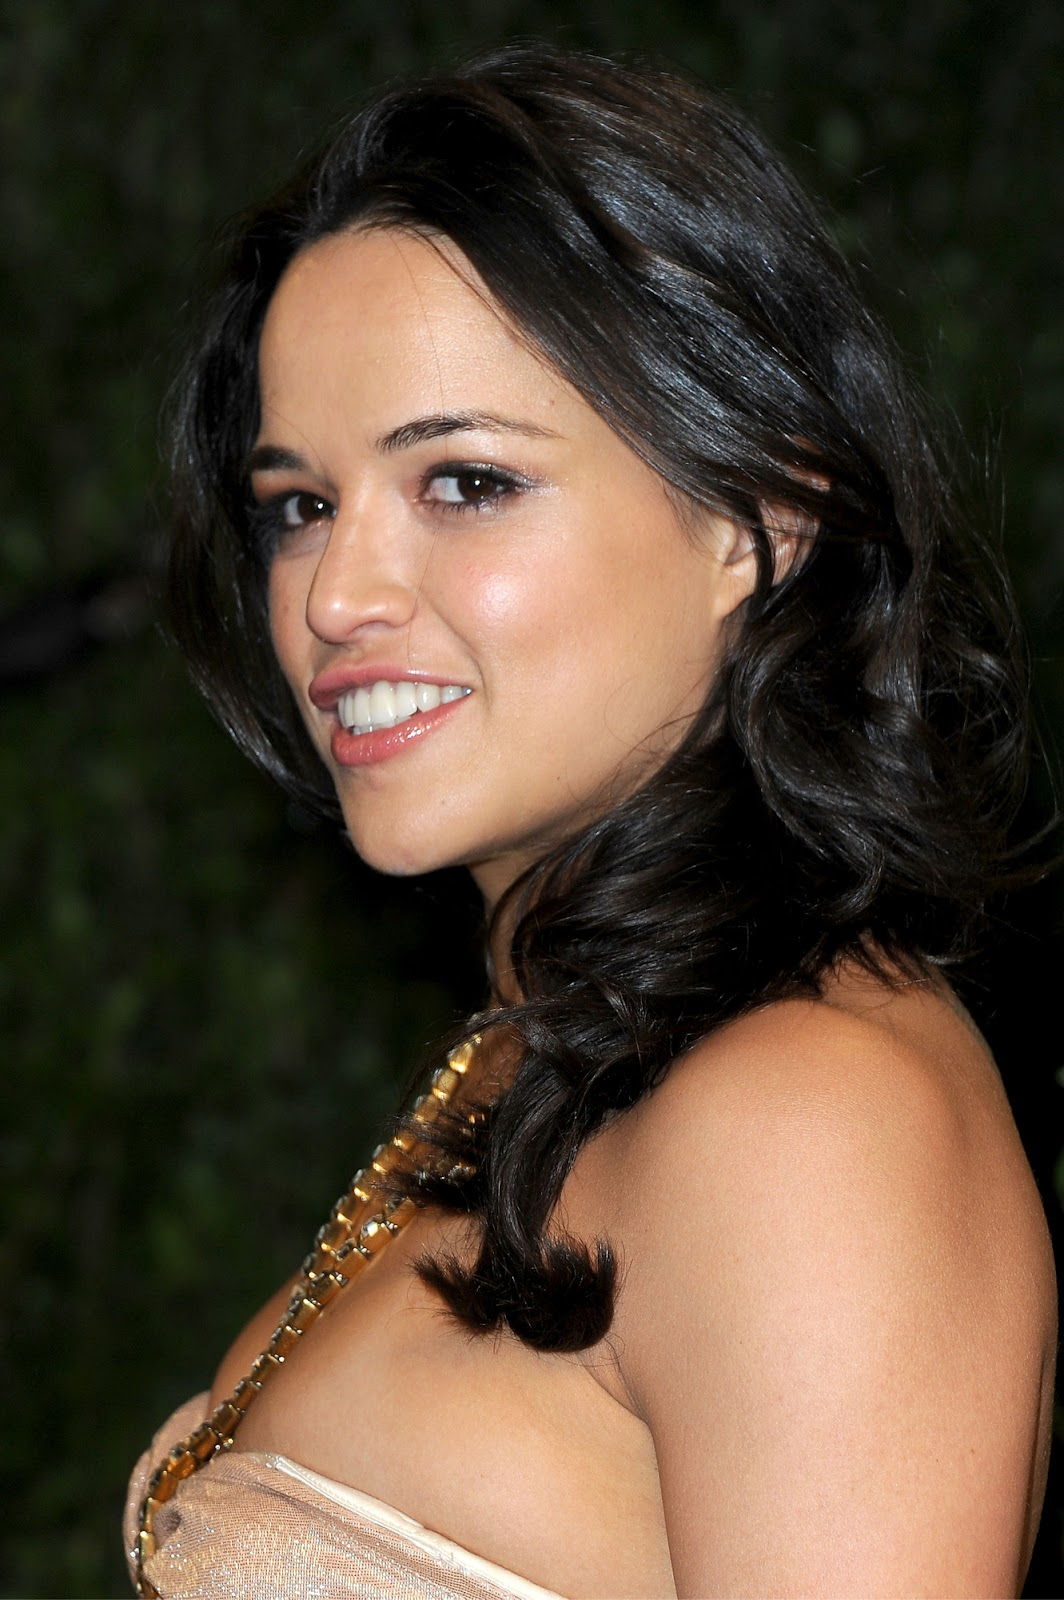 http://1.bp.blogspot.com/-XwMmz2wId7I/USymmdRc0jI/AAAAAAABXsI/YUpBKbidvDI/s1600/Michelle_Rodriguez-Vanity_Fair_Oscar_Party-West_Hollywood-2_24_2013-001.jpg